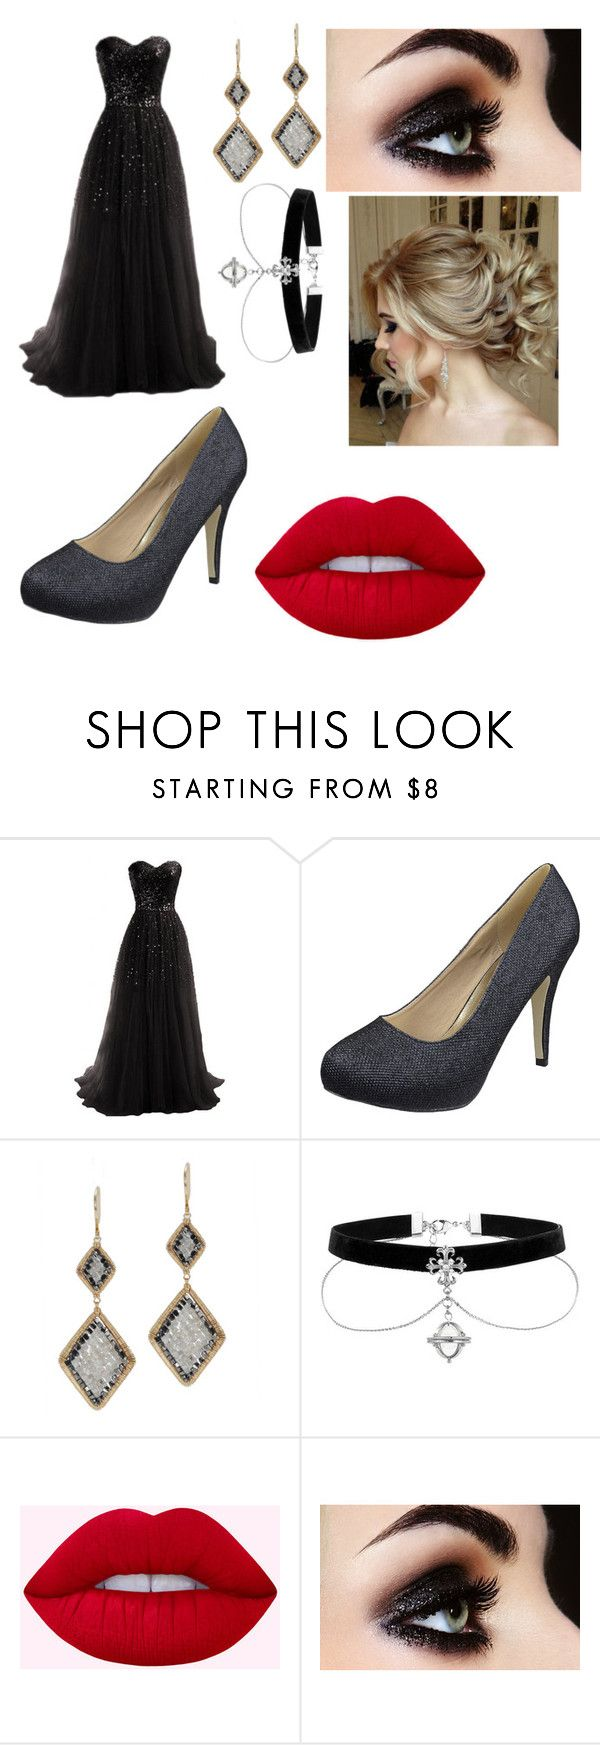 """Women's Fashion"" by rebeccajennings-1 ❤ liked on Polyvore featuring Dana Kellin"